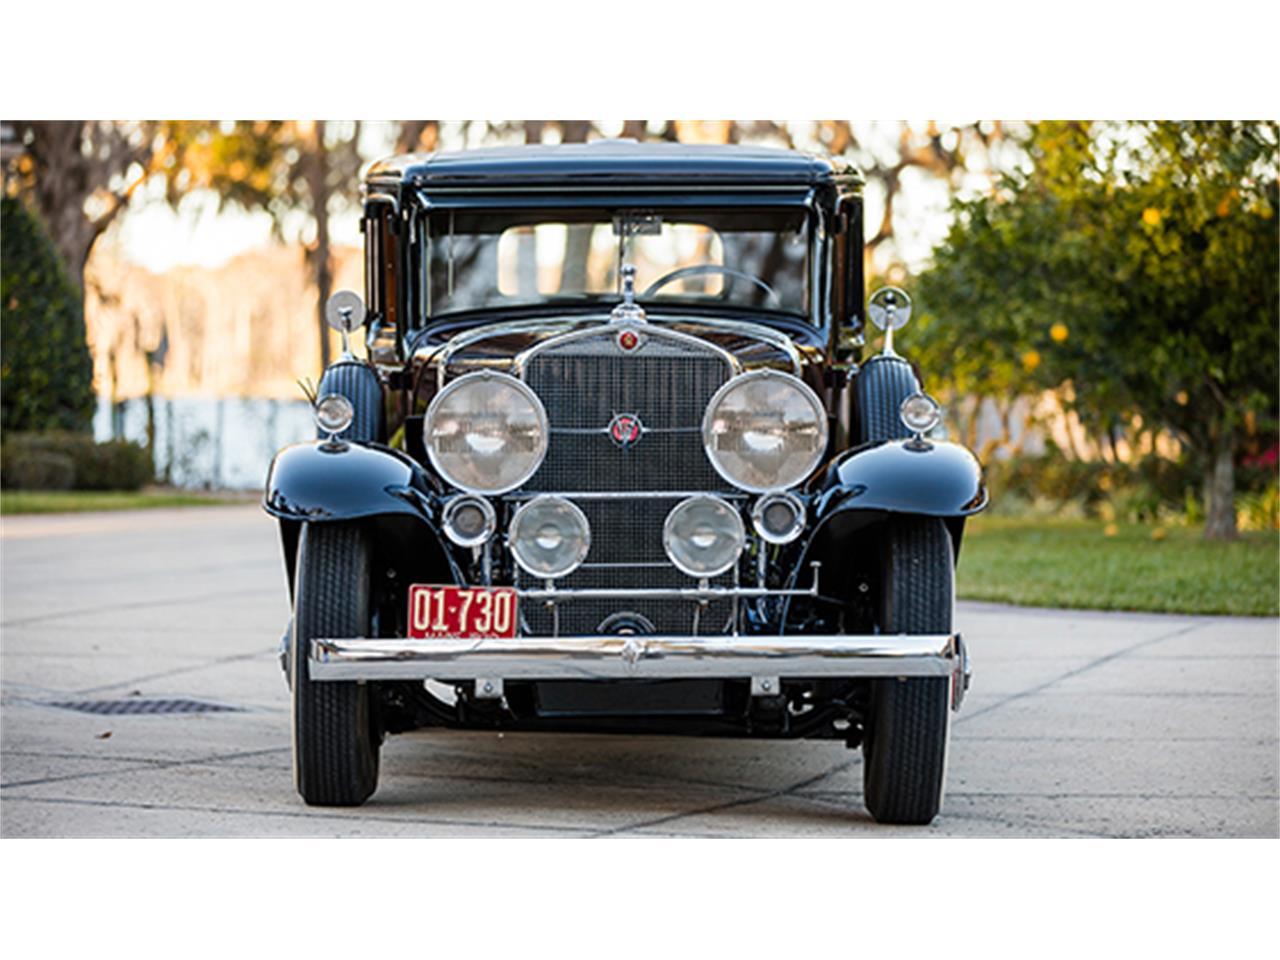 1930 Cadillac V-16 Club Sedan for Sale | ClassicCars.com ...